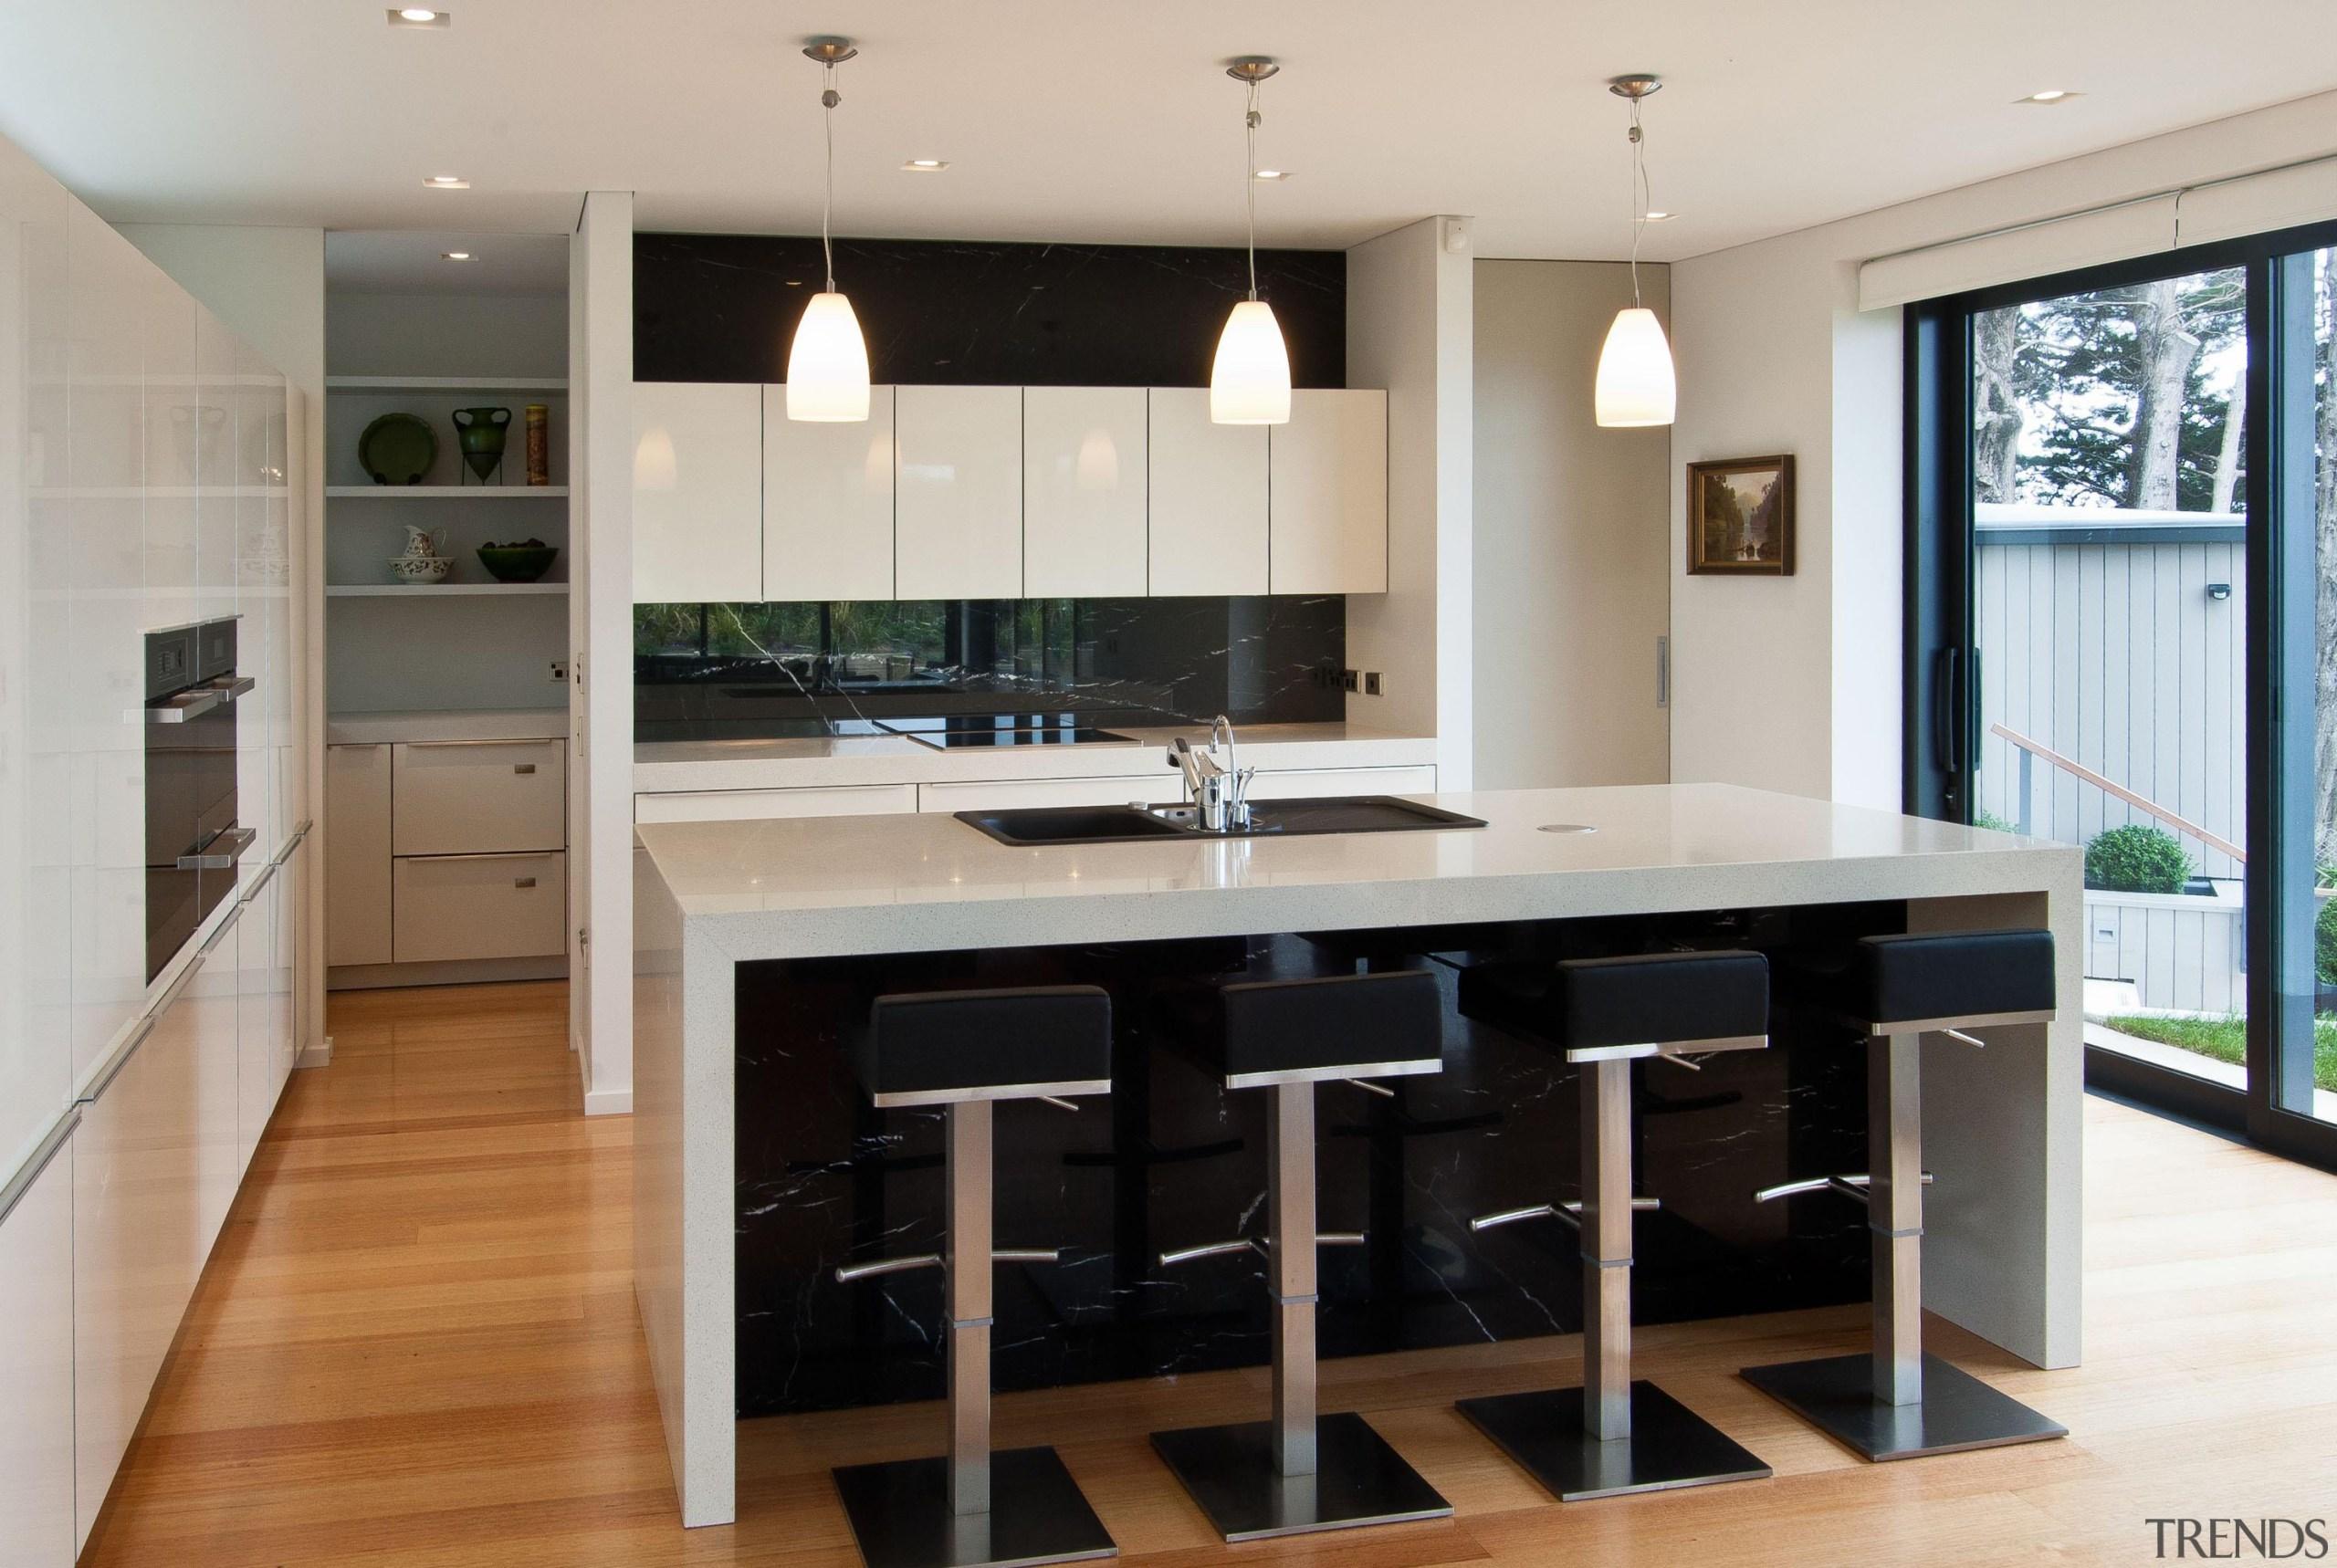 Khandallah Kitchen - Khandallah Kitchen - cabinetry | cabinetry, countertop, cuisine classique, floor, flooring, interior design, kitchen, room, wood flooring, gray